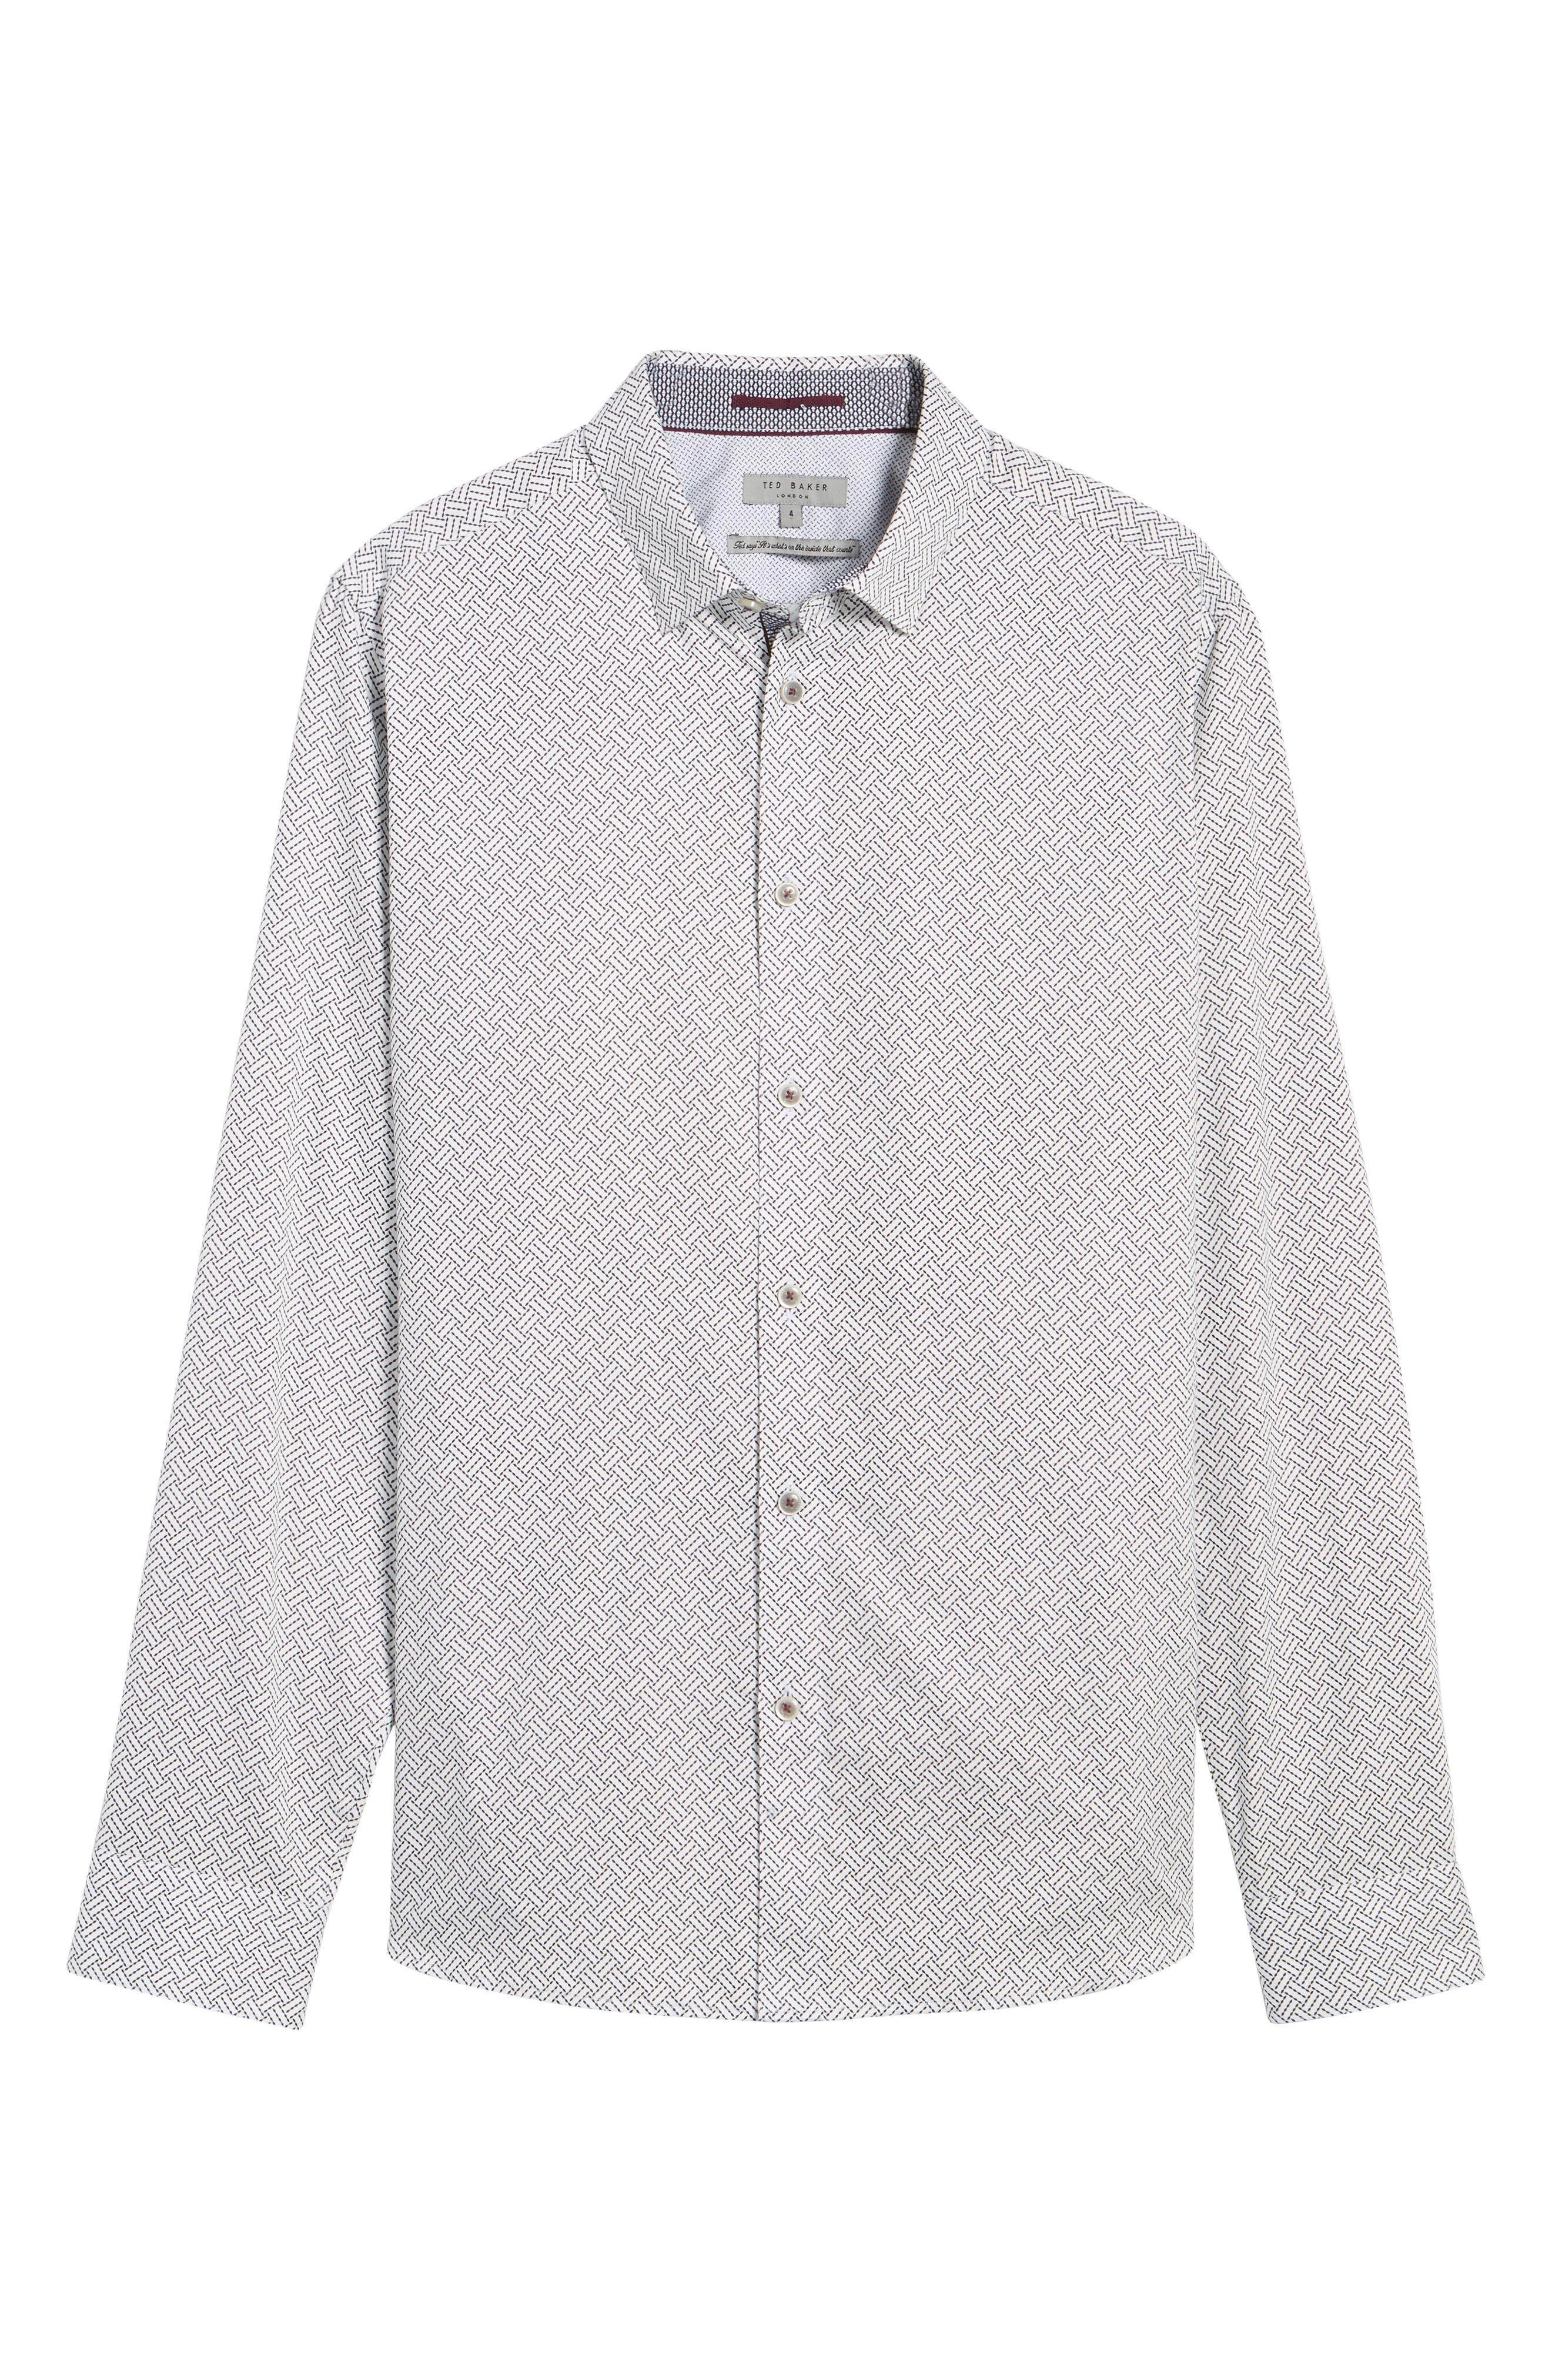 Larosh Slim Fit Basket Weave Print Sport Shirt,                             Alternate thumbnail 6, color,                             White